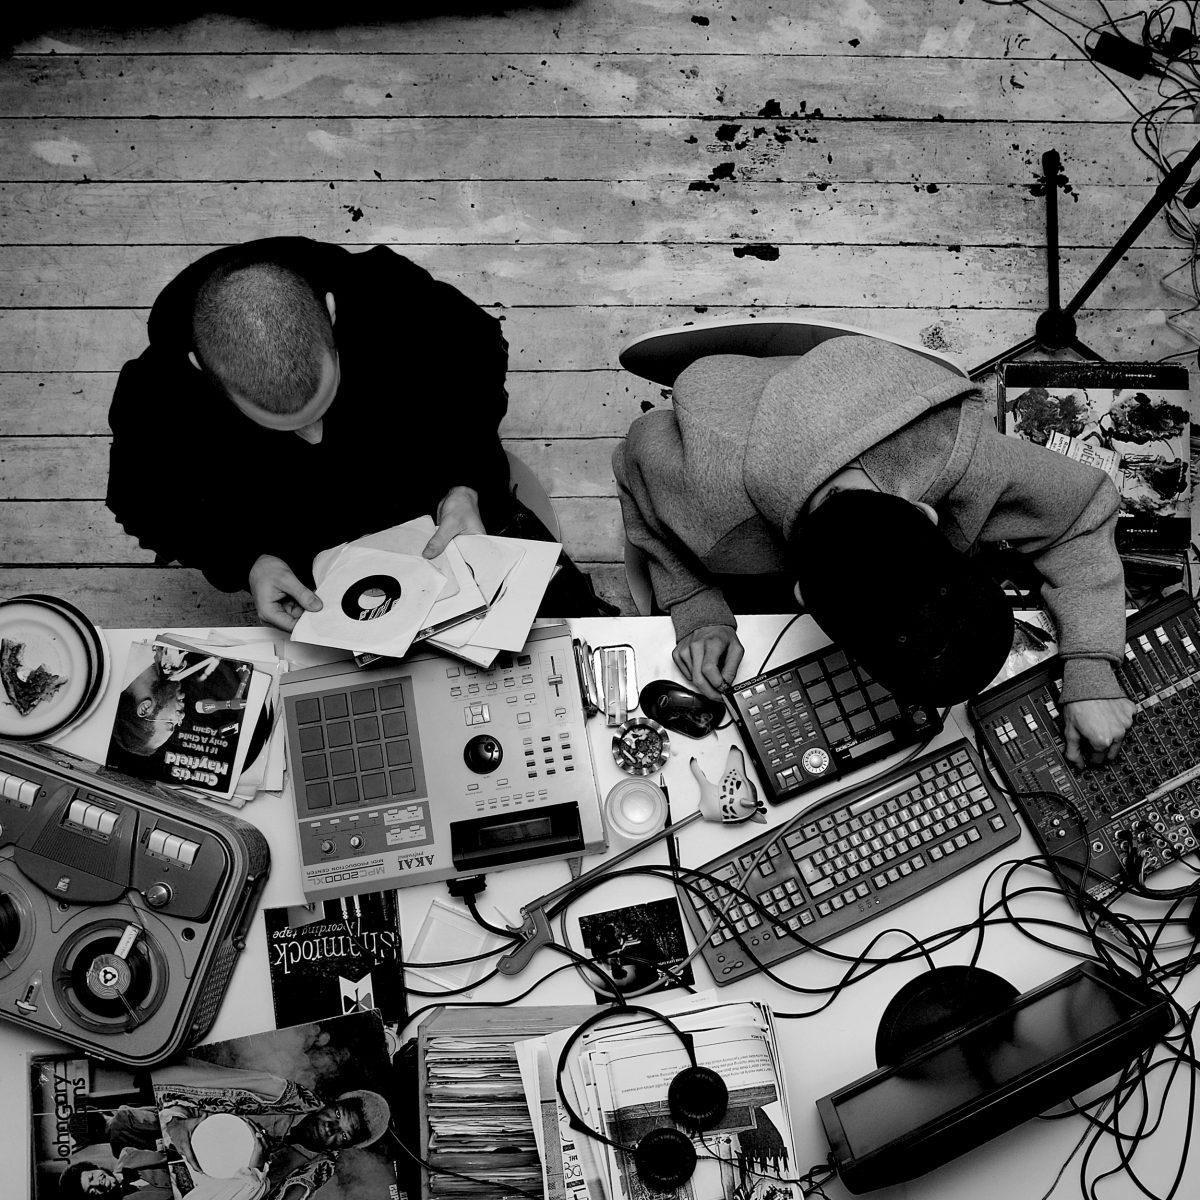 10+ Years of Beatmaking, Captured by Robert Winter (Interview)